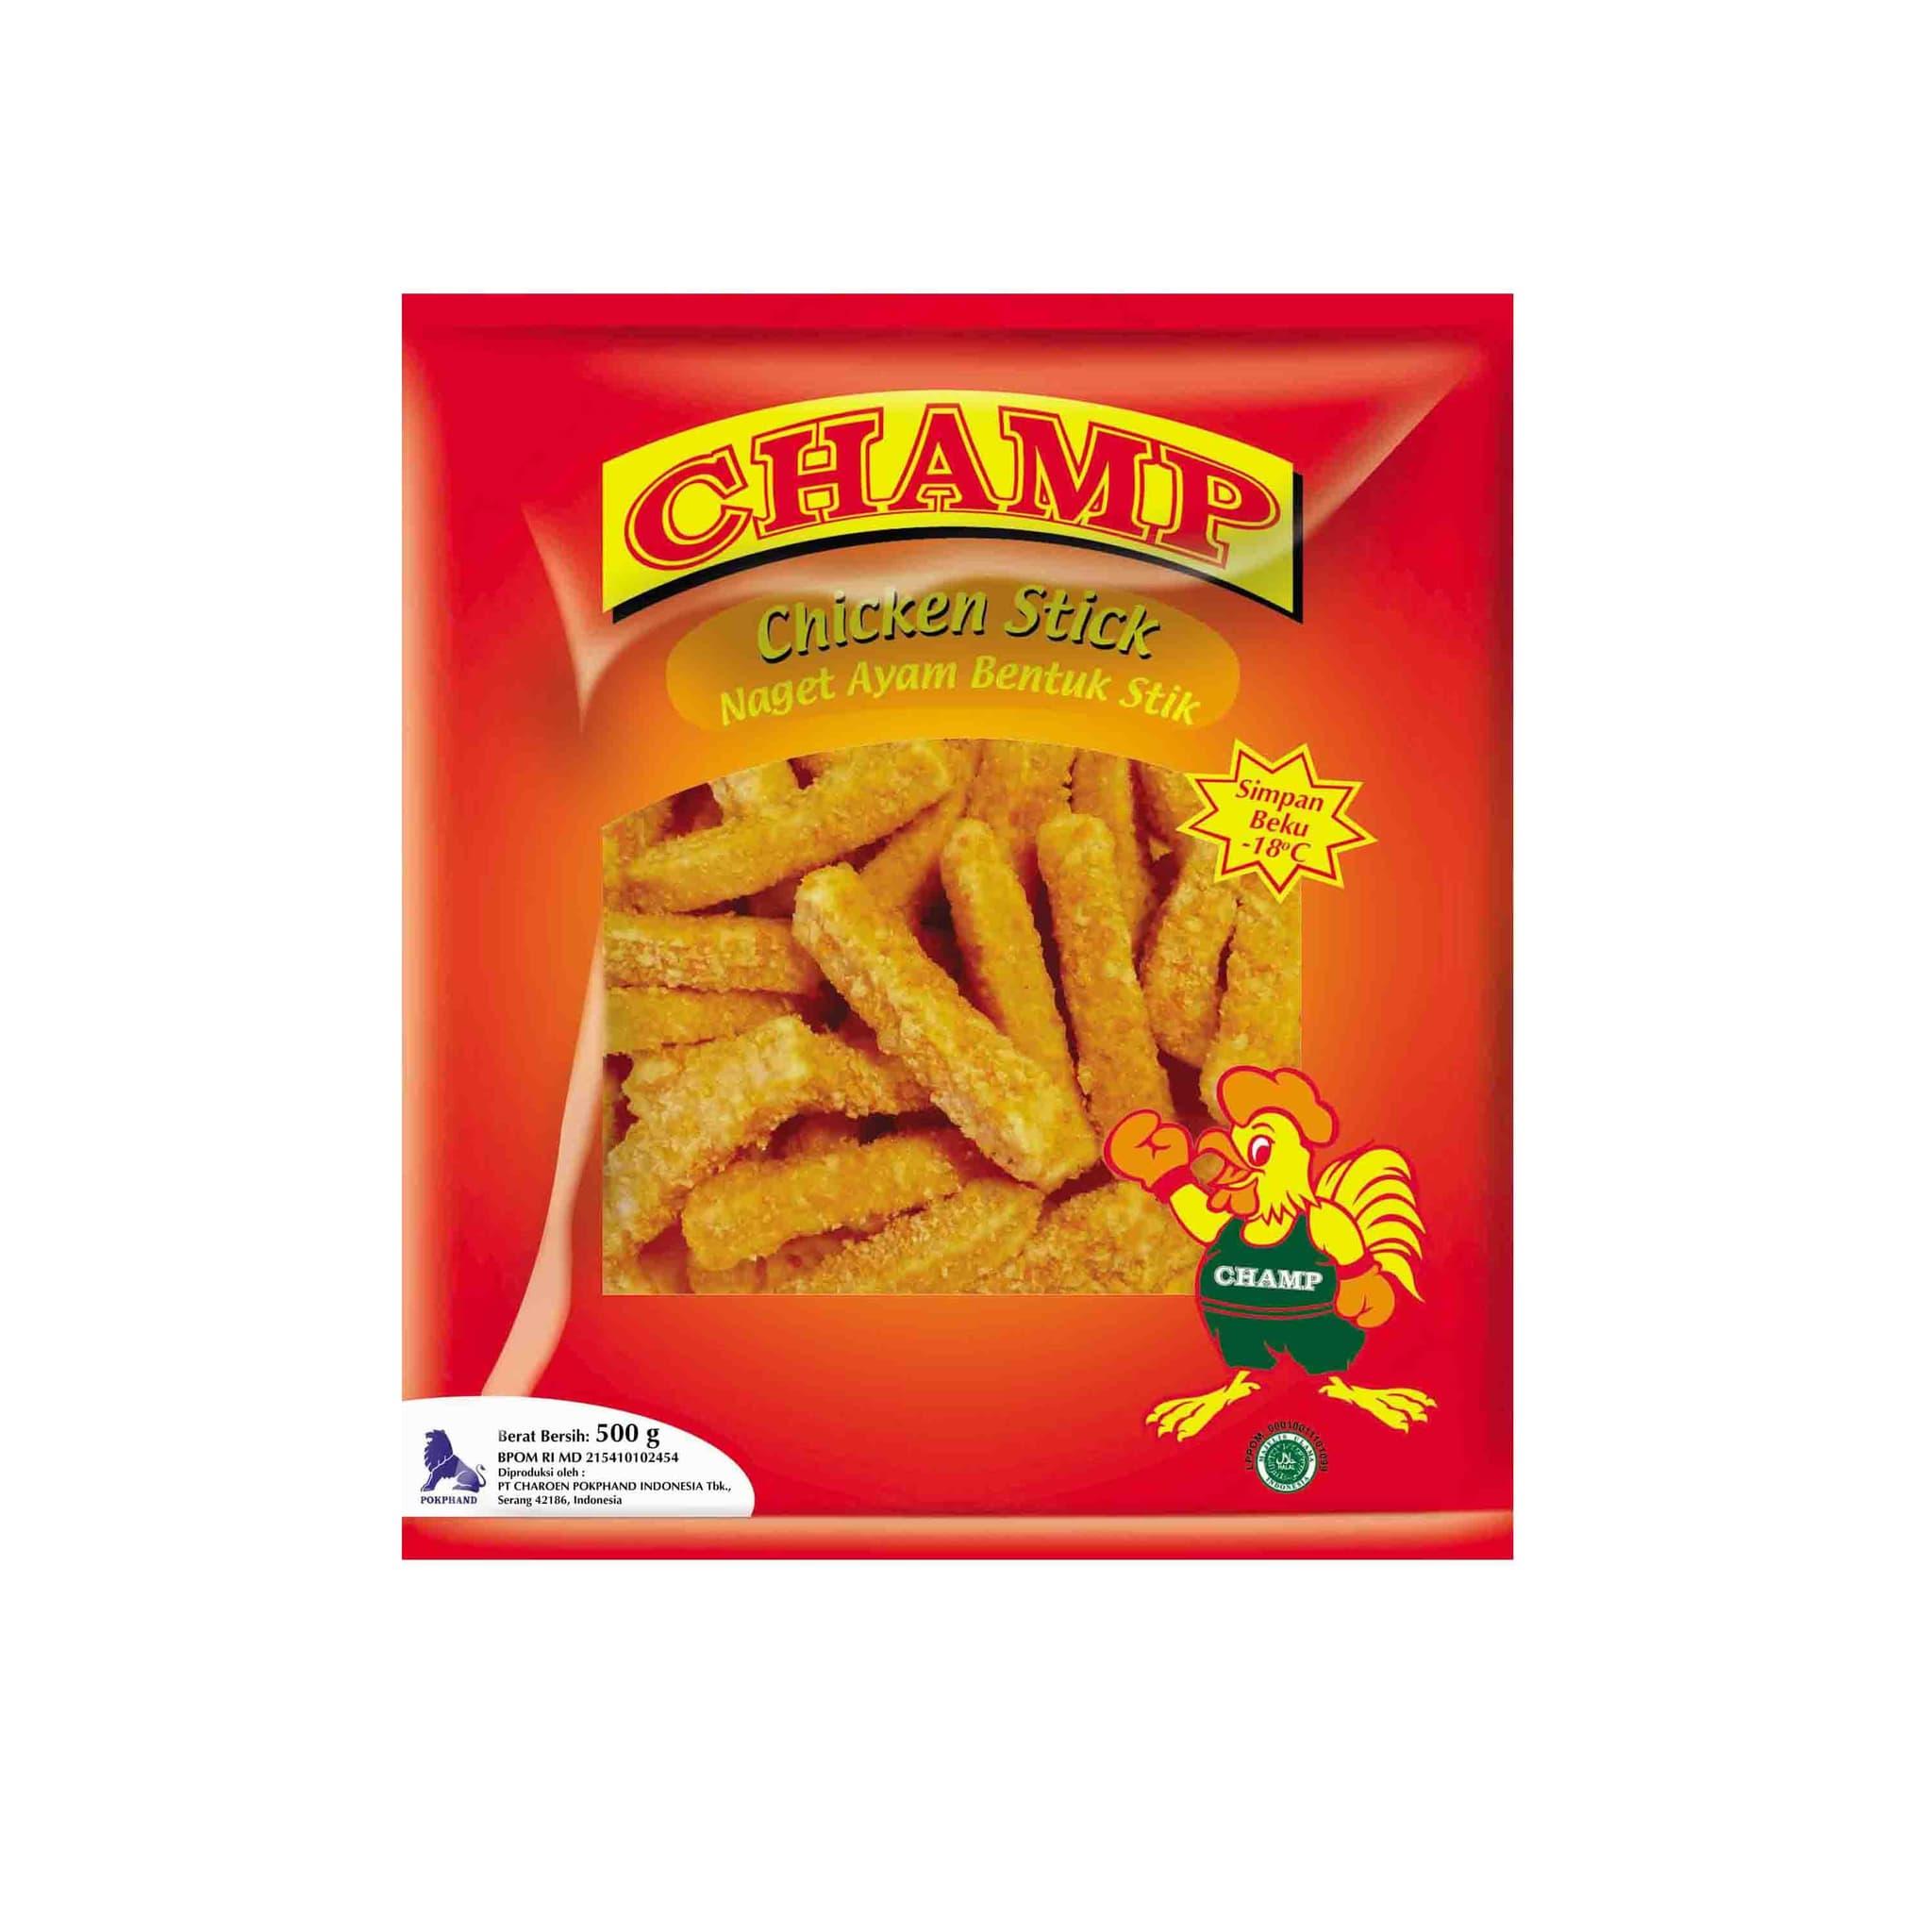 Champ Paket Chicken Stick Makanan Instan 500 G (4 Pcs) - Blanja.com